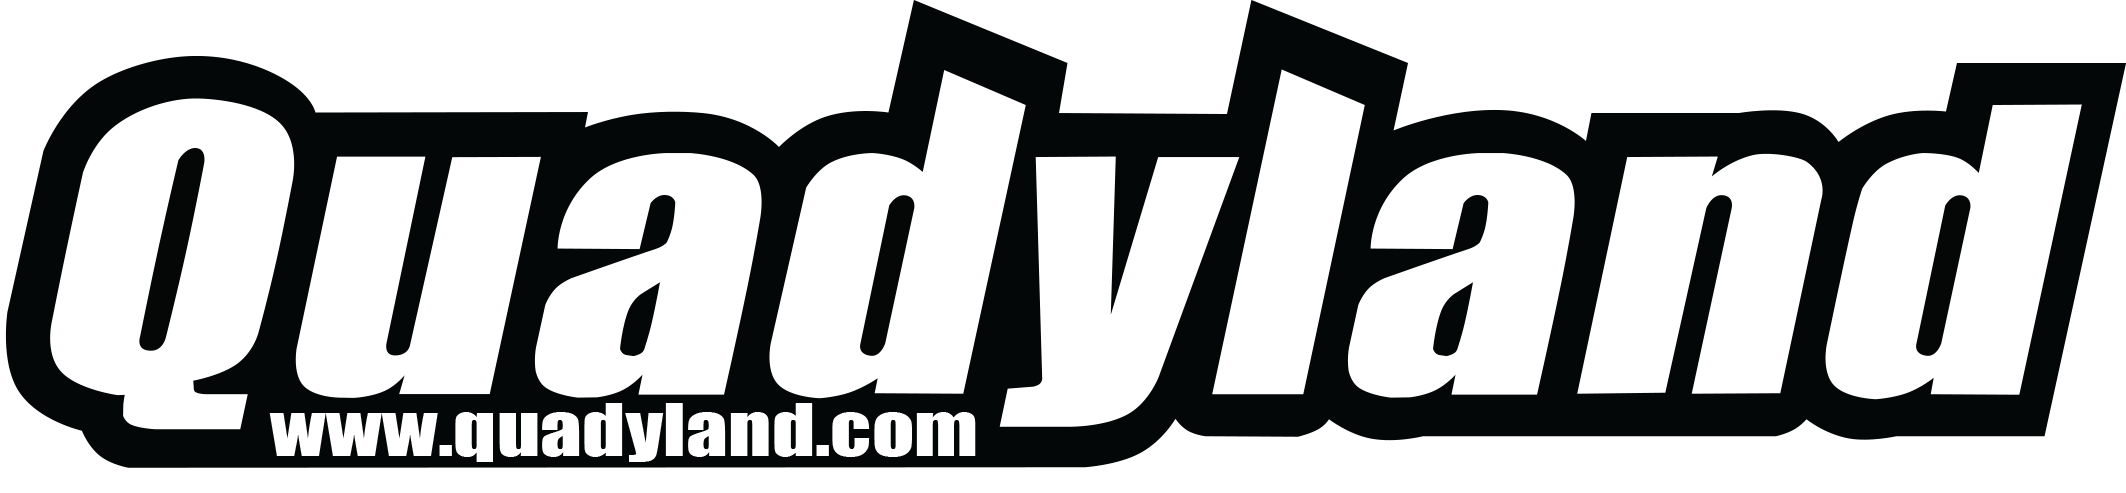 Logo_quadyland_noir.png